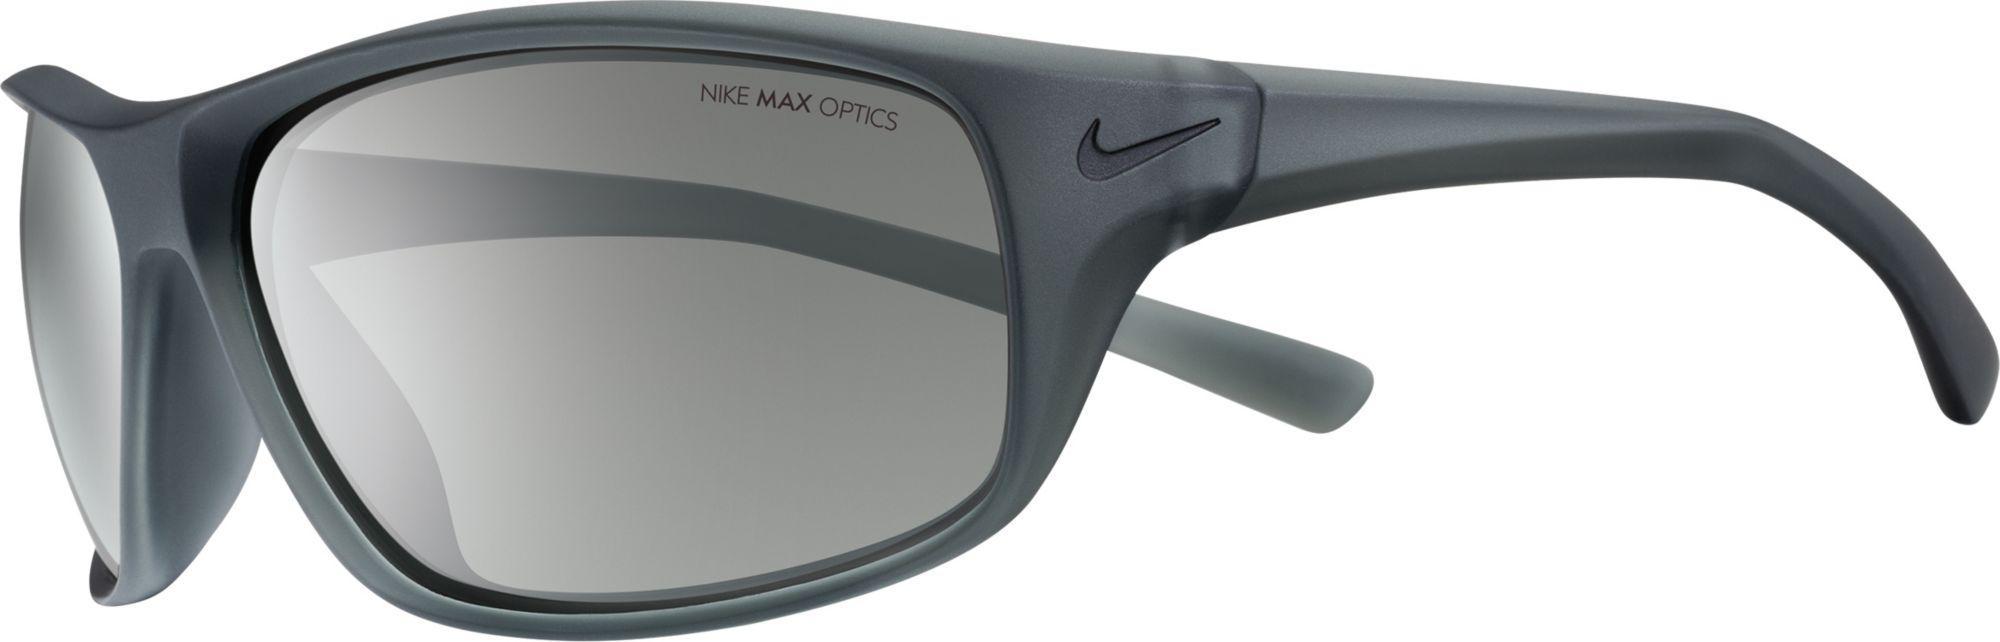 7c63c5fe49 Lyst - Nike Adrenaline Sunglasses in Gray for Men